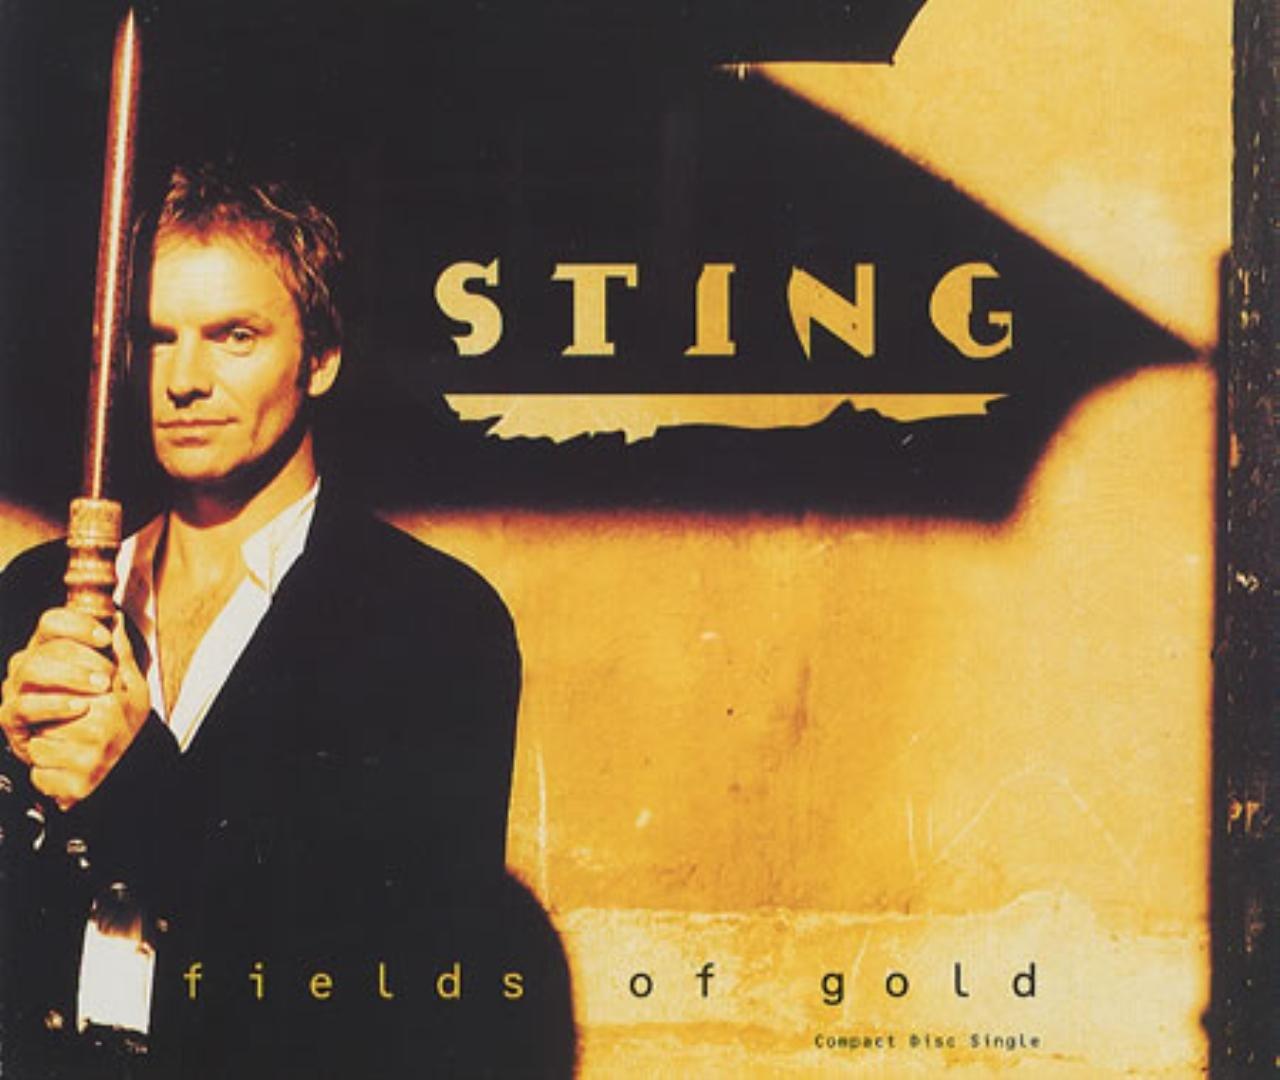 Sting - Fields Of Gold - [CDS] - Amazon.com Music